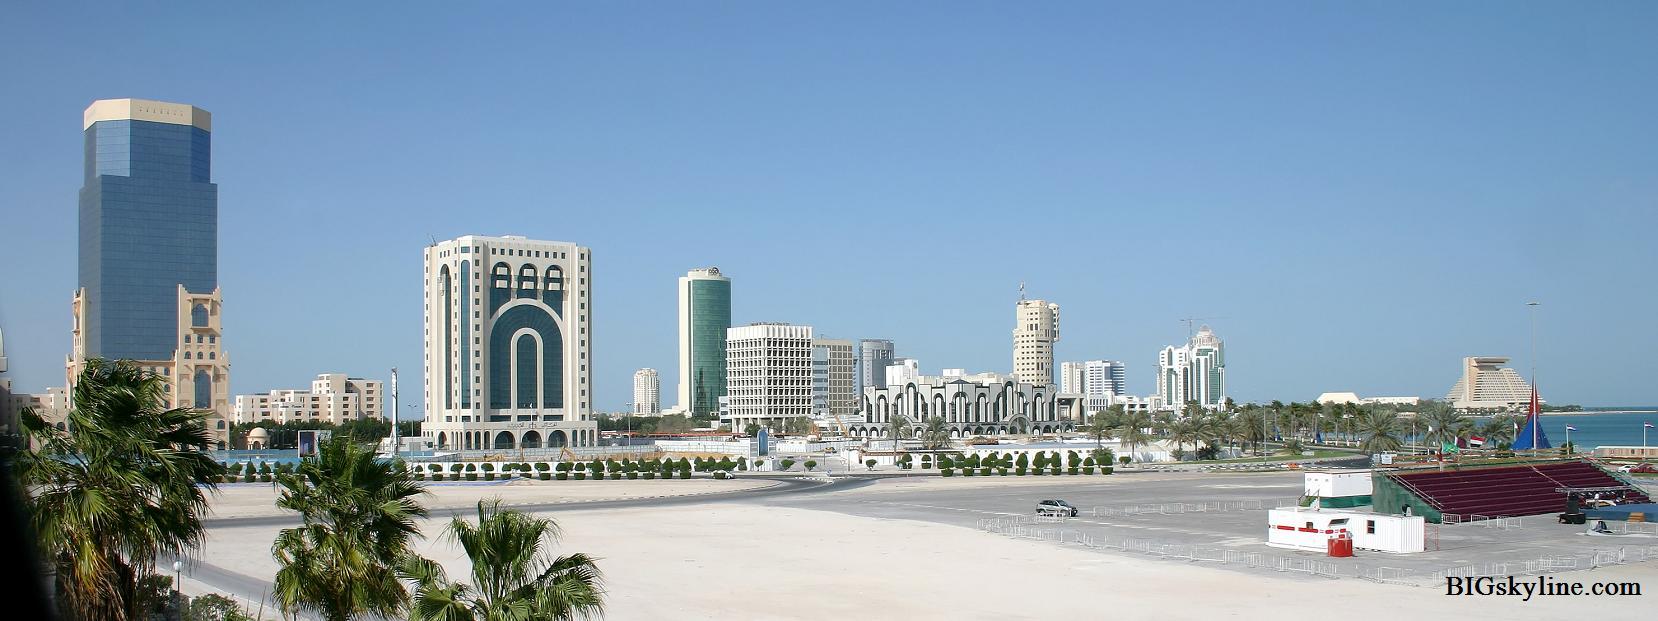 Doha Qatar  City pictures : Skyline Doha Qatar